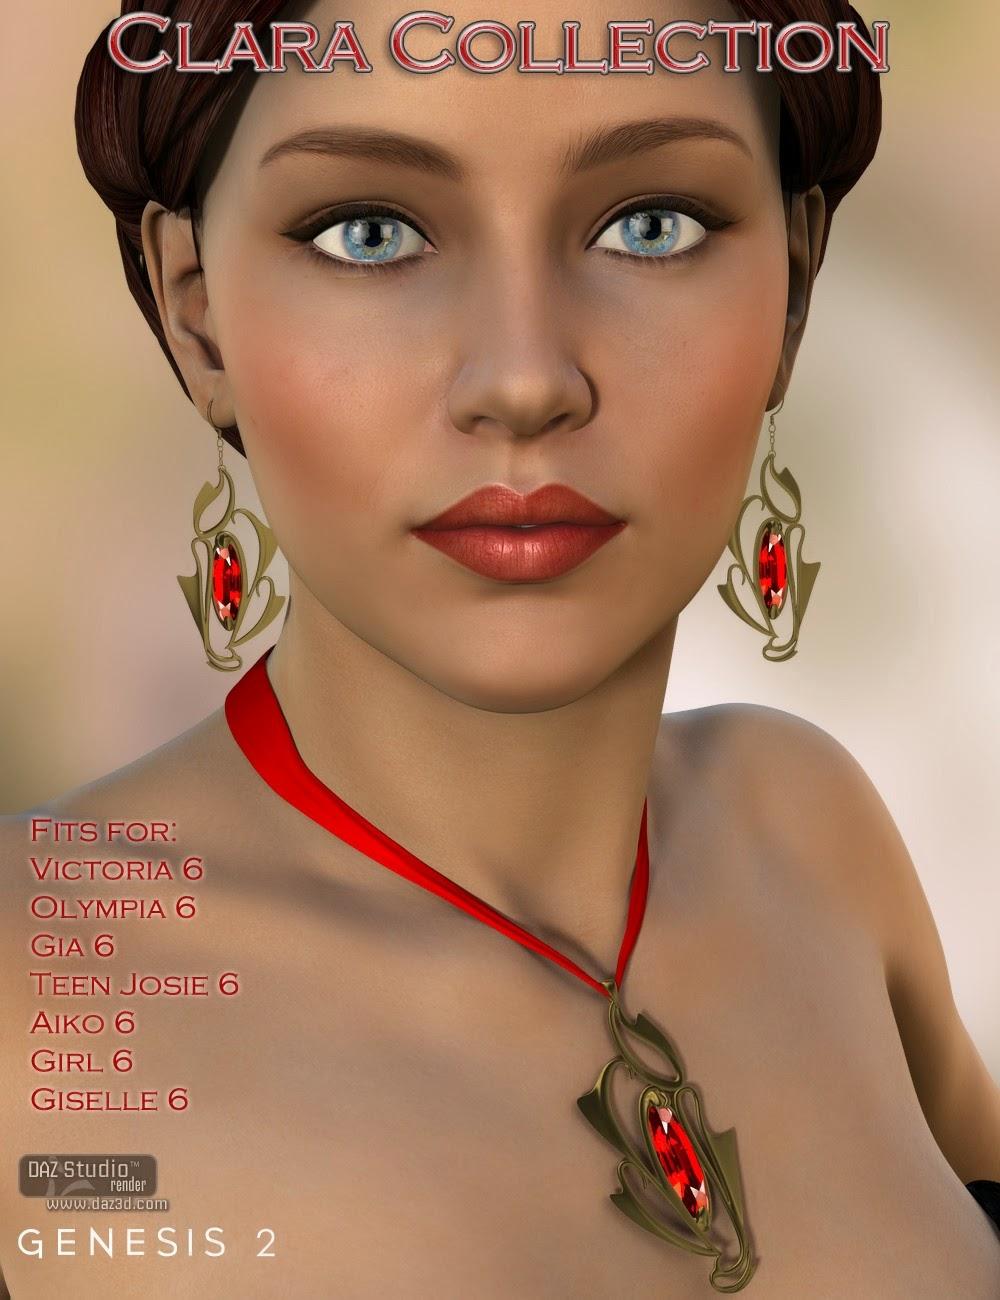 Daz3d For Genesis 2 female